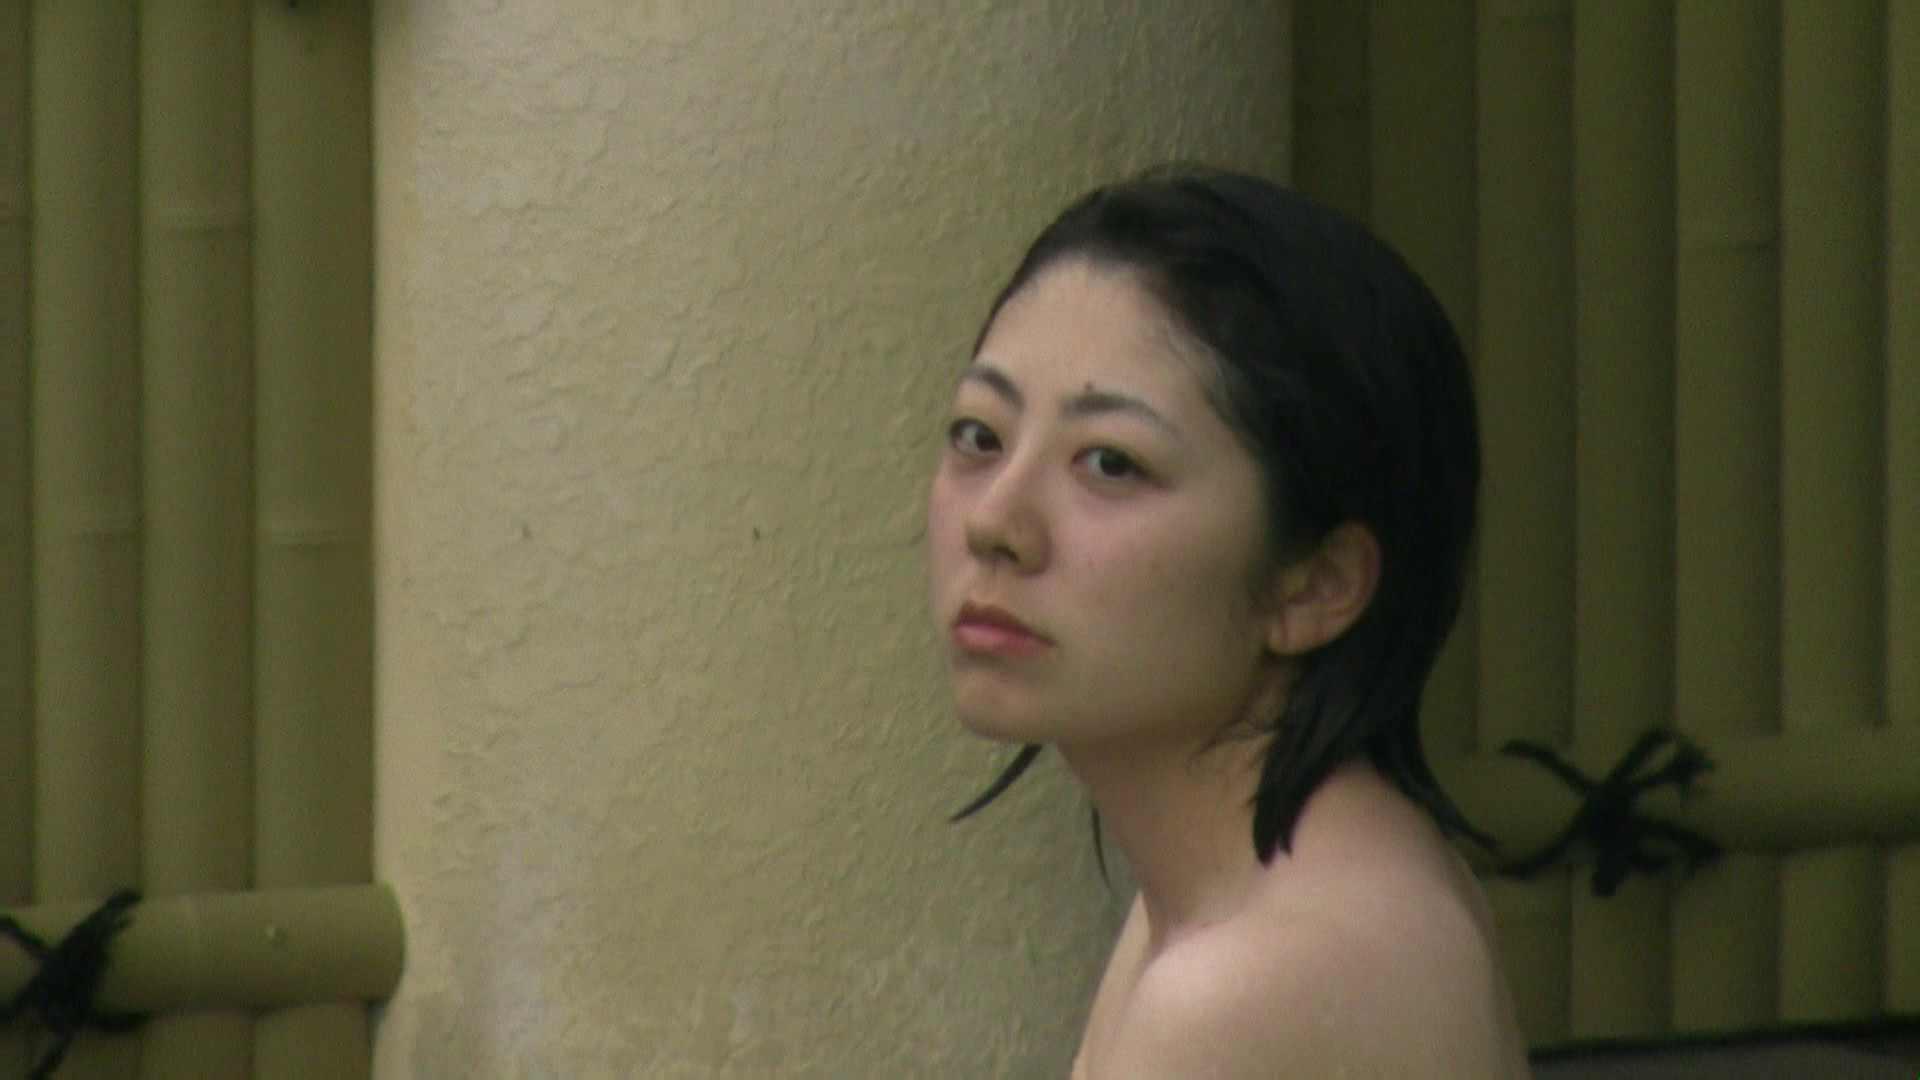 Aquaな露天風呂Vol.04 露天 | 盗撮特撮  10pic 4